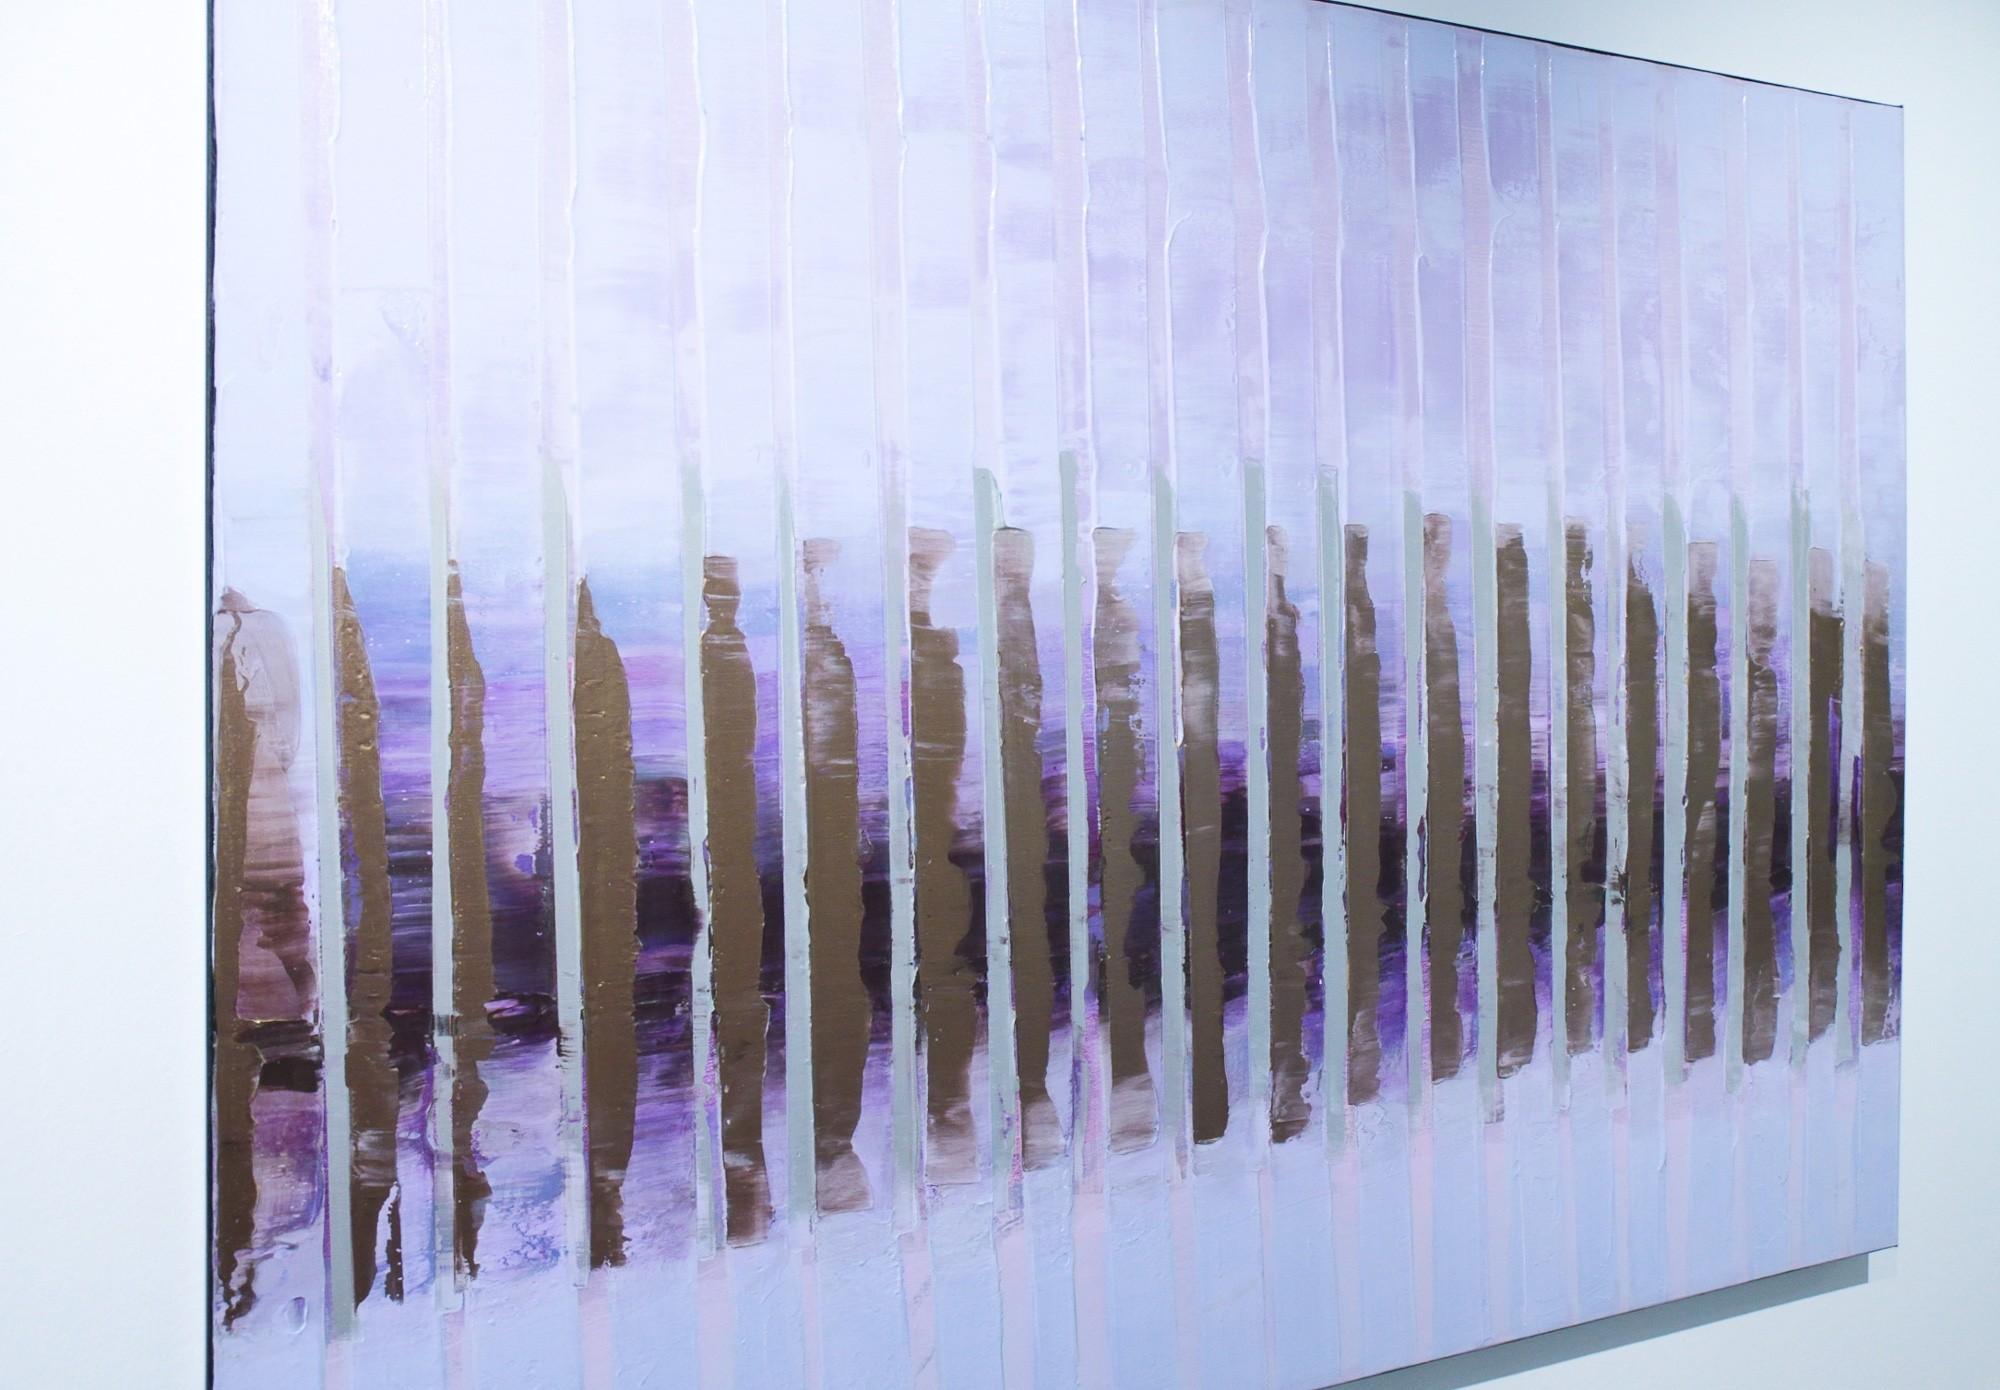 Pink November | Malerei von Lali Torma | Acryl auf Leinwand, abstrakt (2)